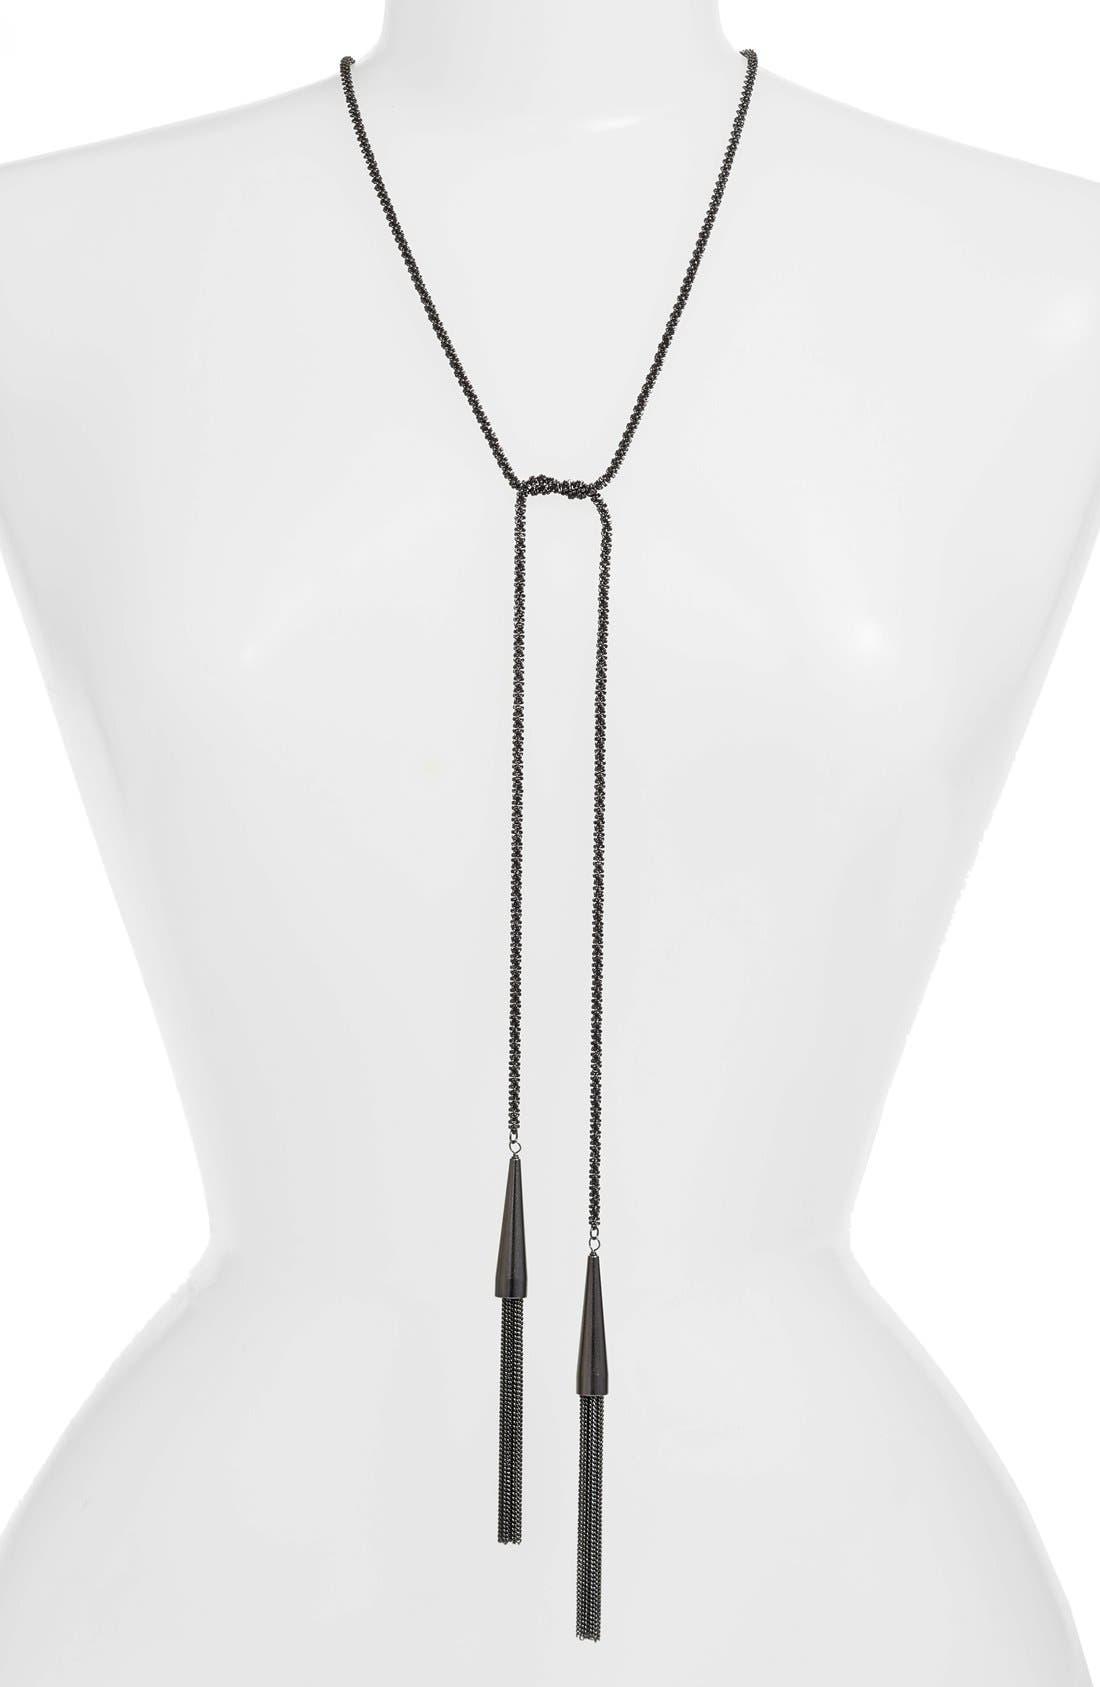 Kendra Scott 'Phara' Tassel Lariat Necklace